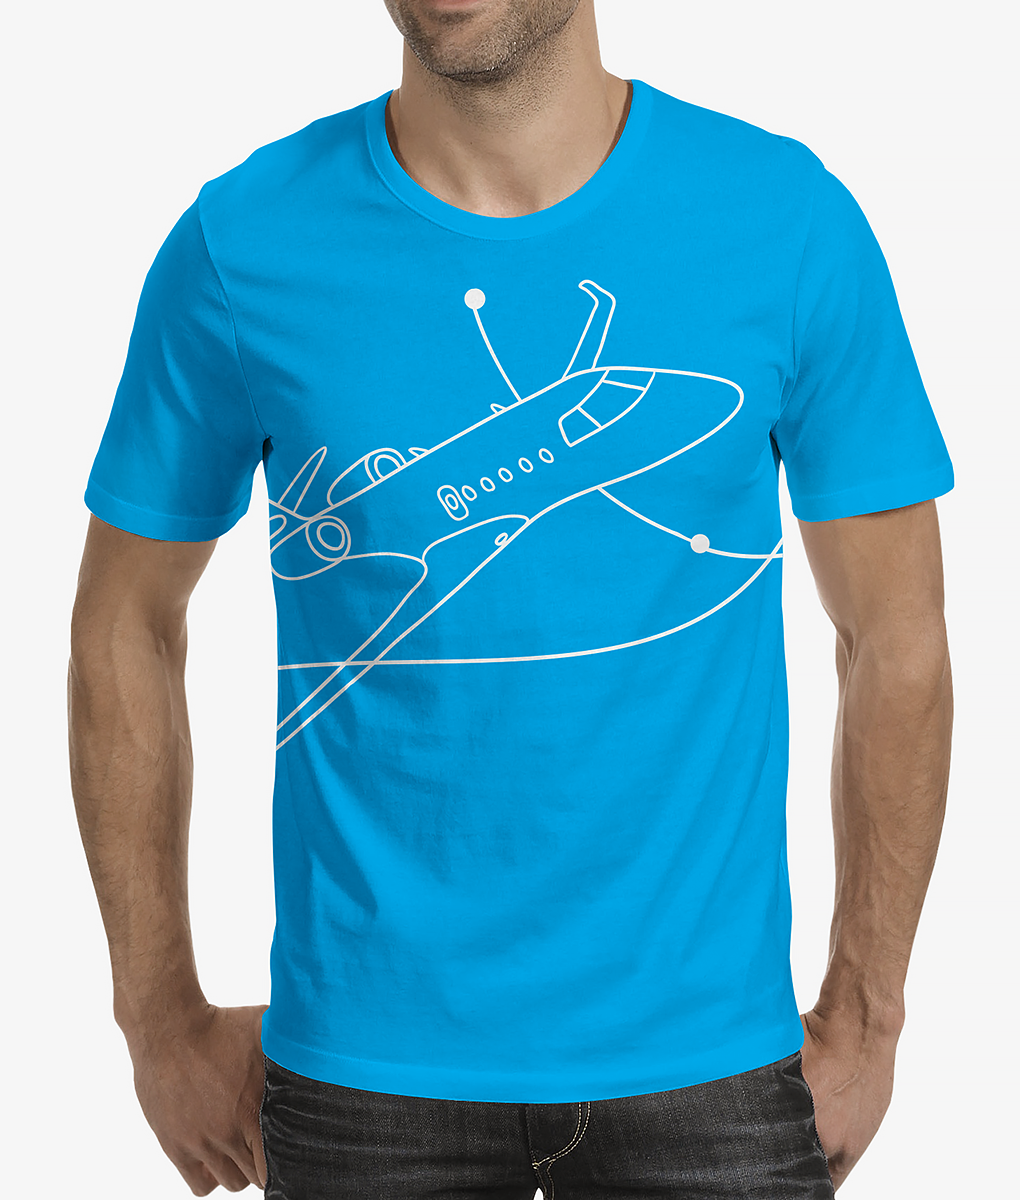 t-shirt_man_2